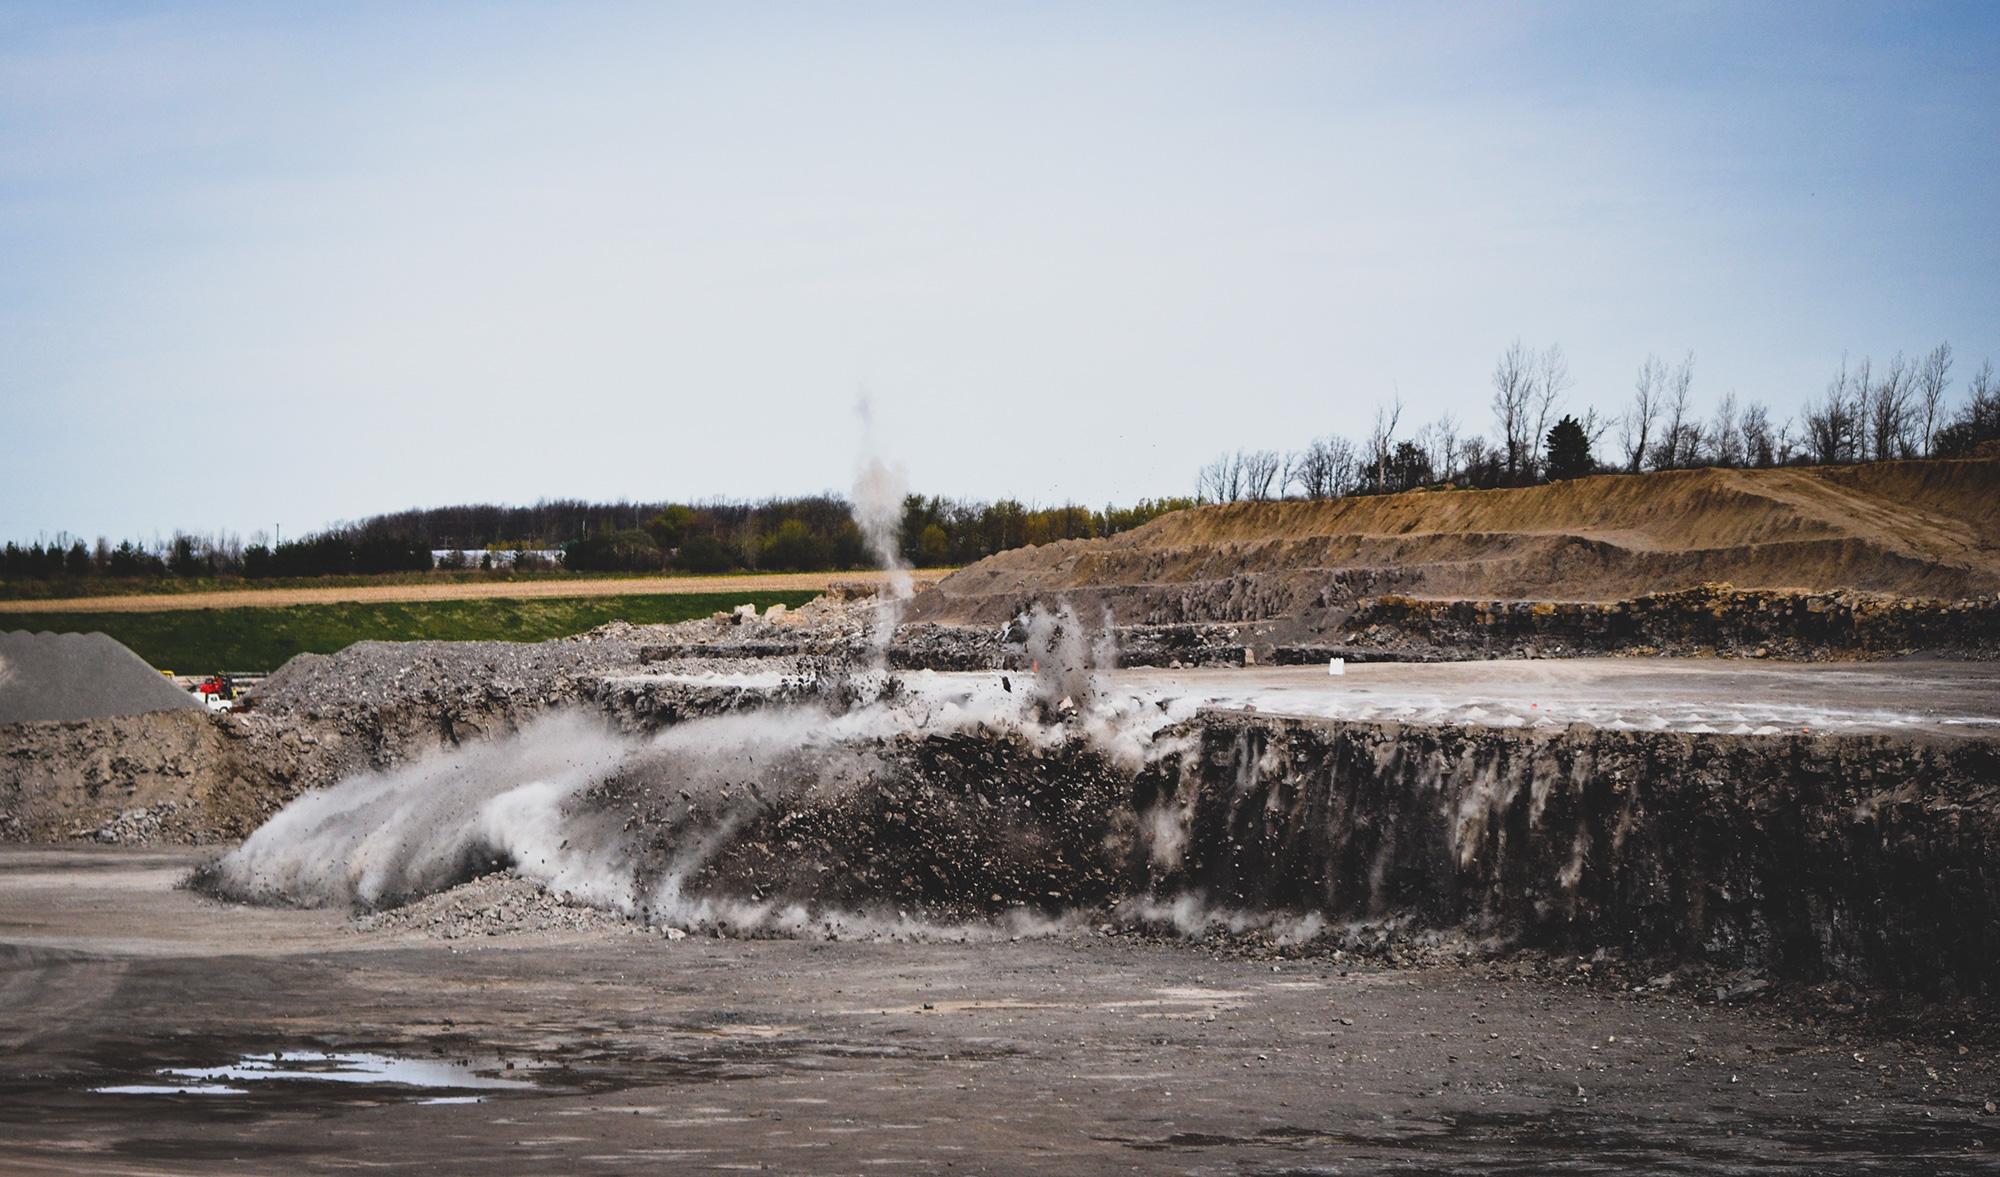 Austin Powder Company blast at a quarry.